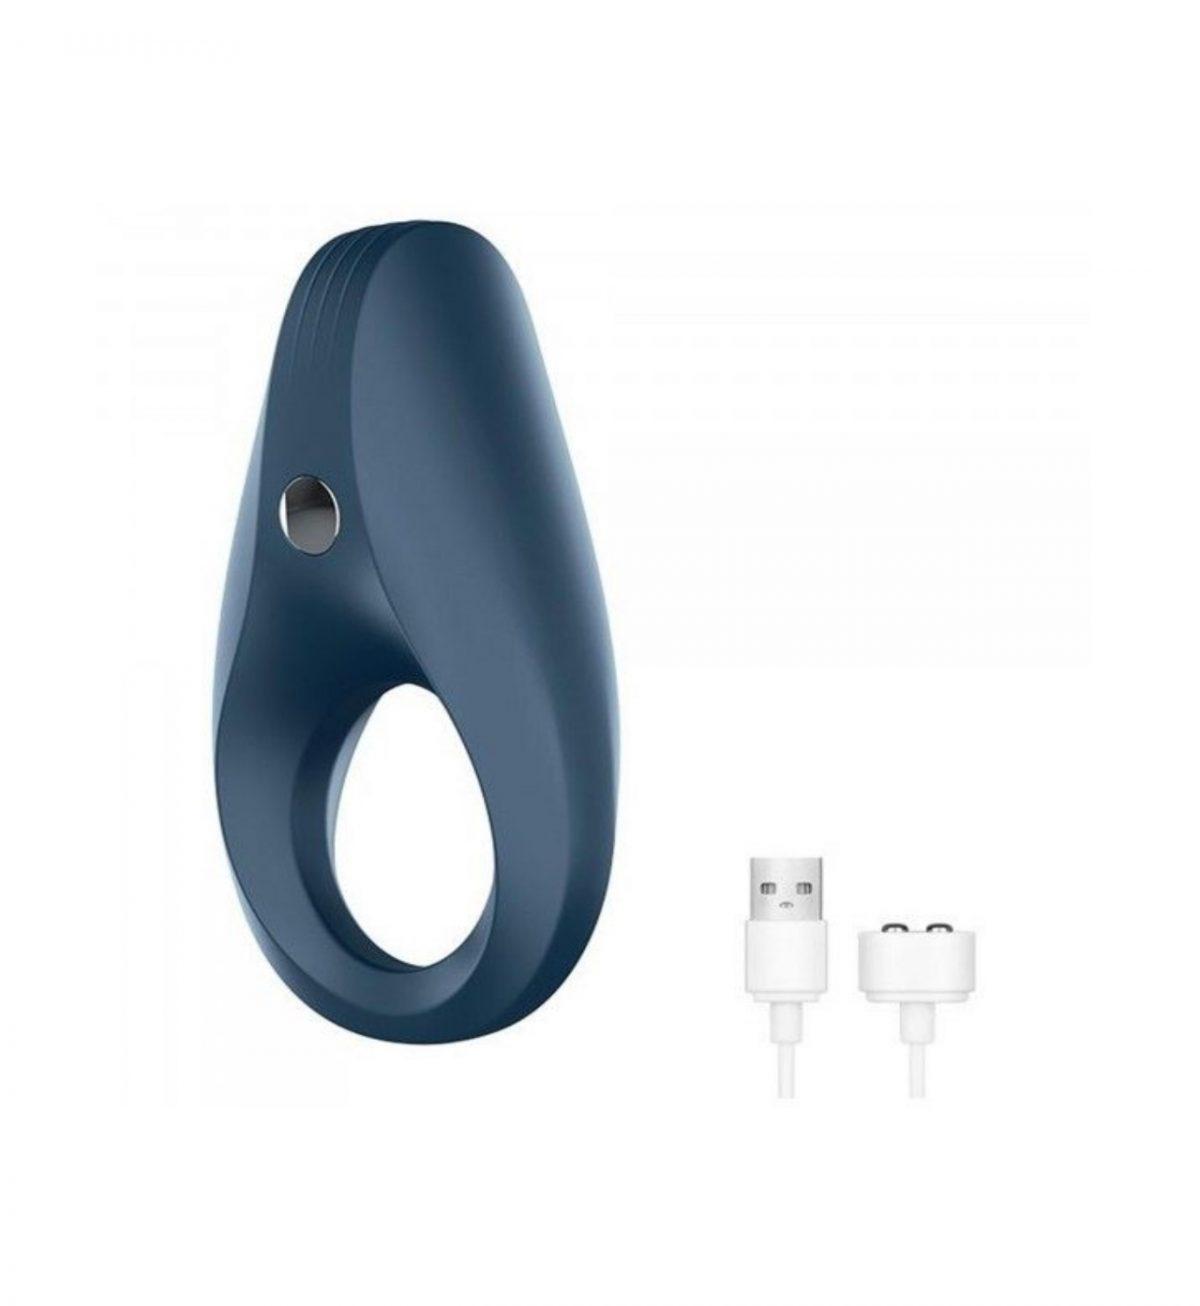 Vibrating Ring 1 - Vibrerende penisring for begges nytelse - Satisfyer